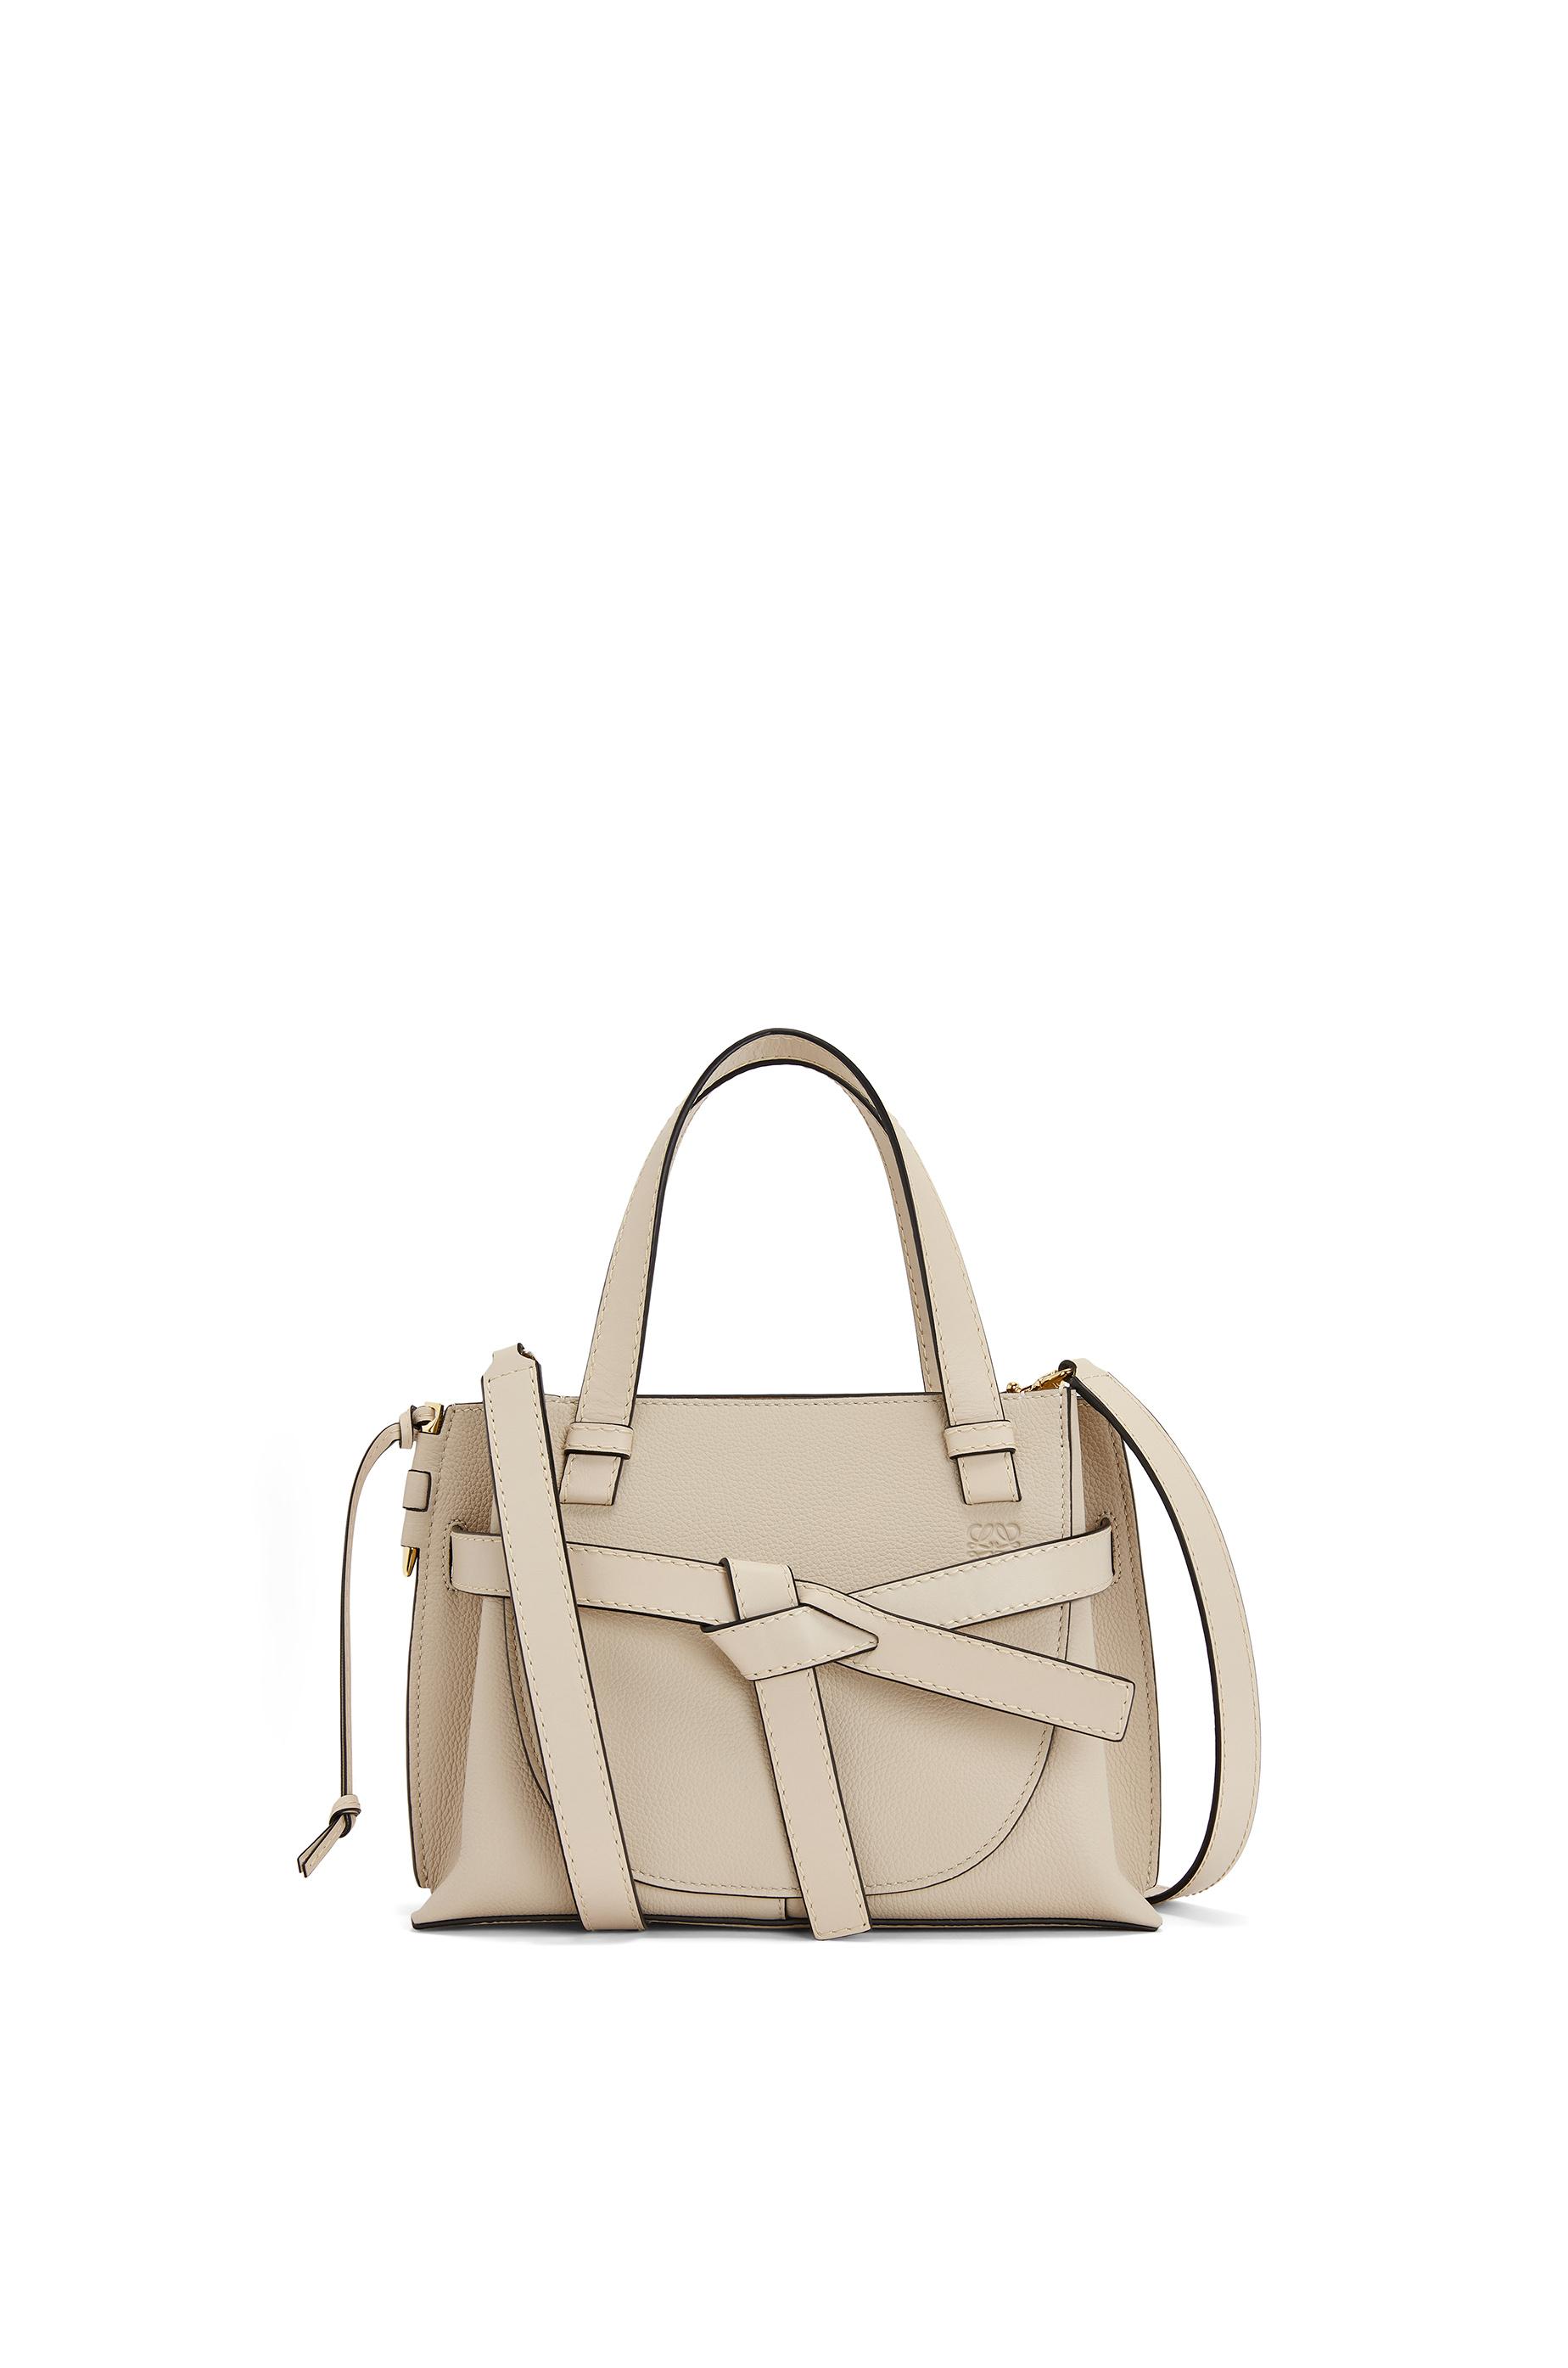 Navy Public Affairs Support Element Womens Tote Bags Canvas Shoulder Bag Casual Handbags